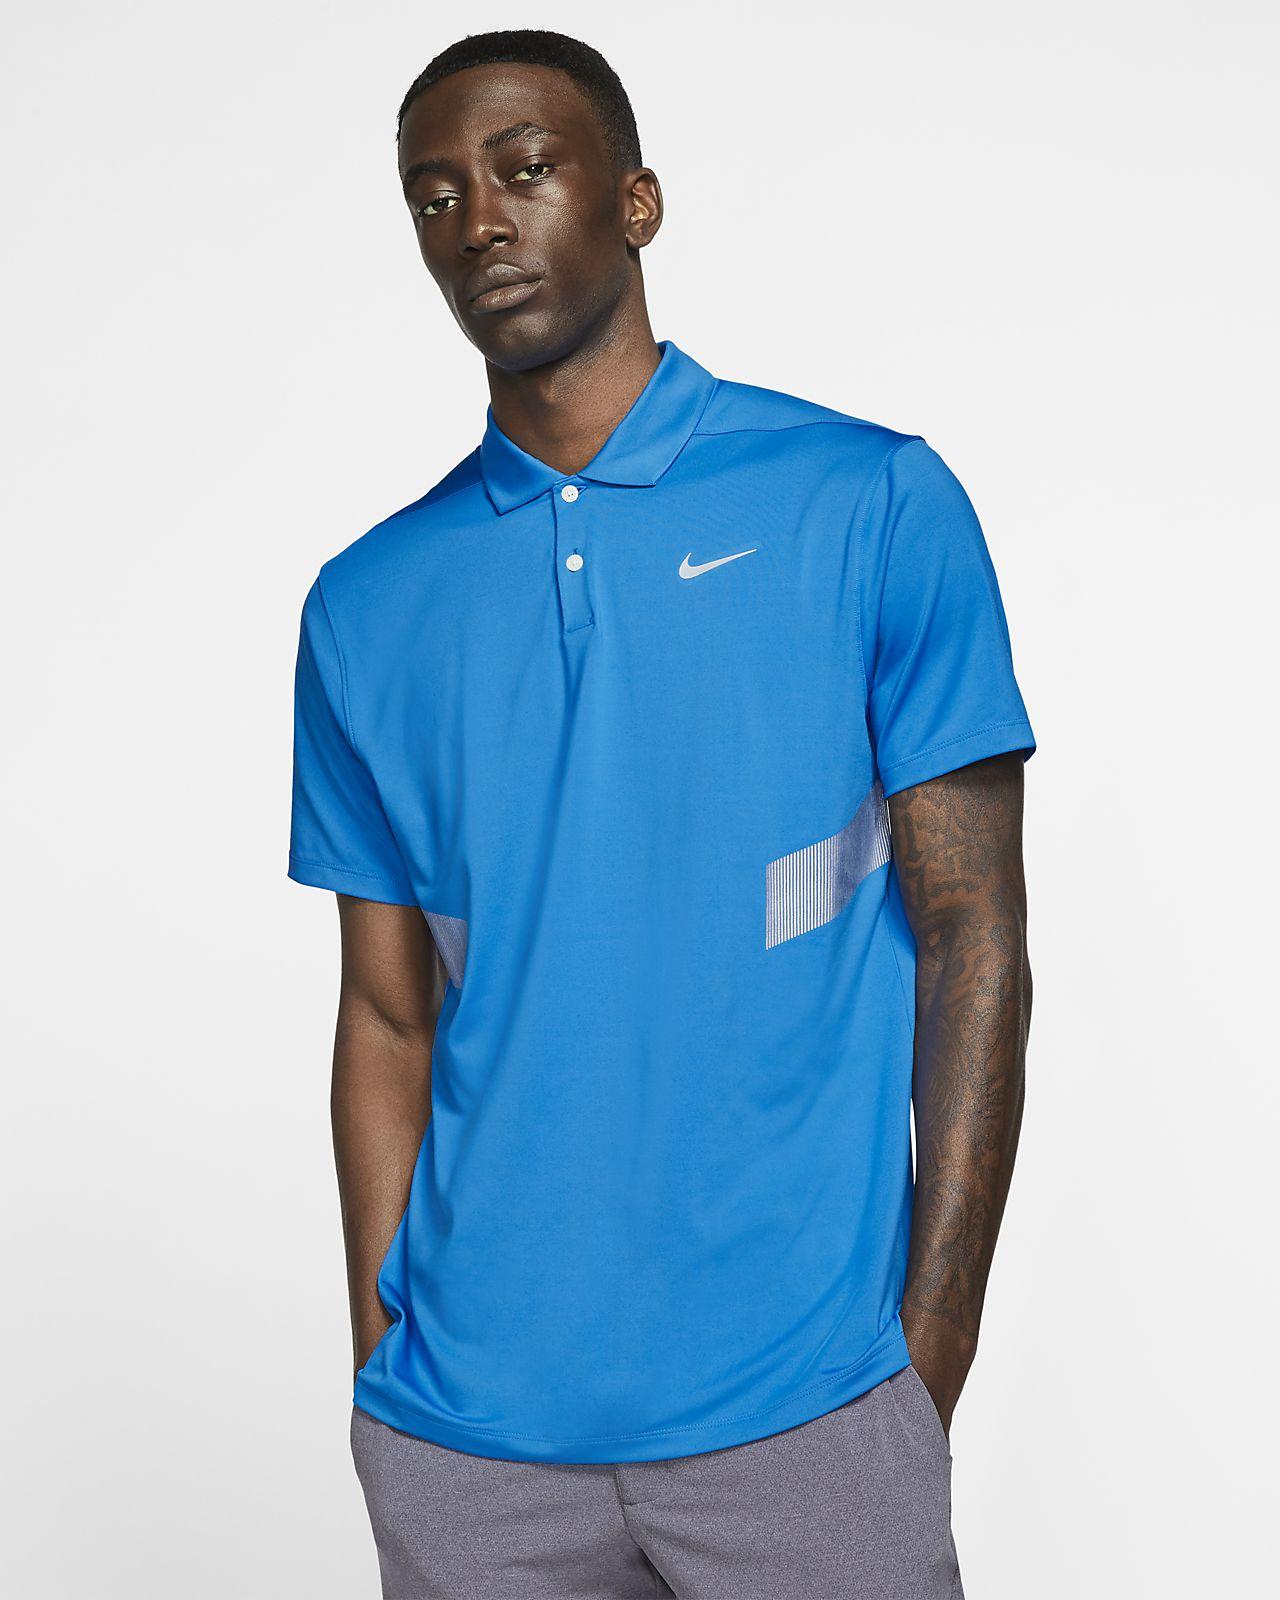 Męska koszulka polo do golfa Nike Dri-FIT Vapor